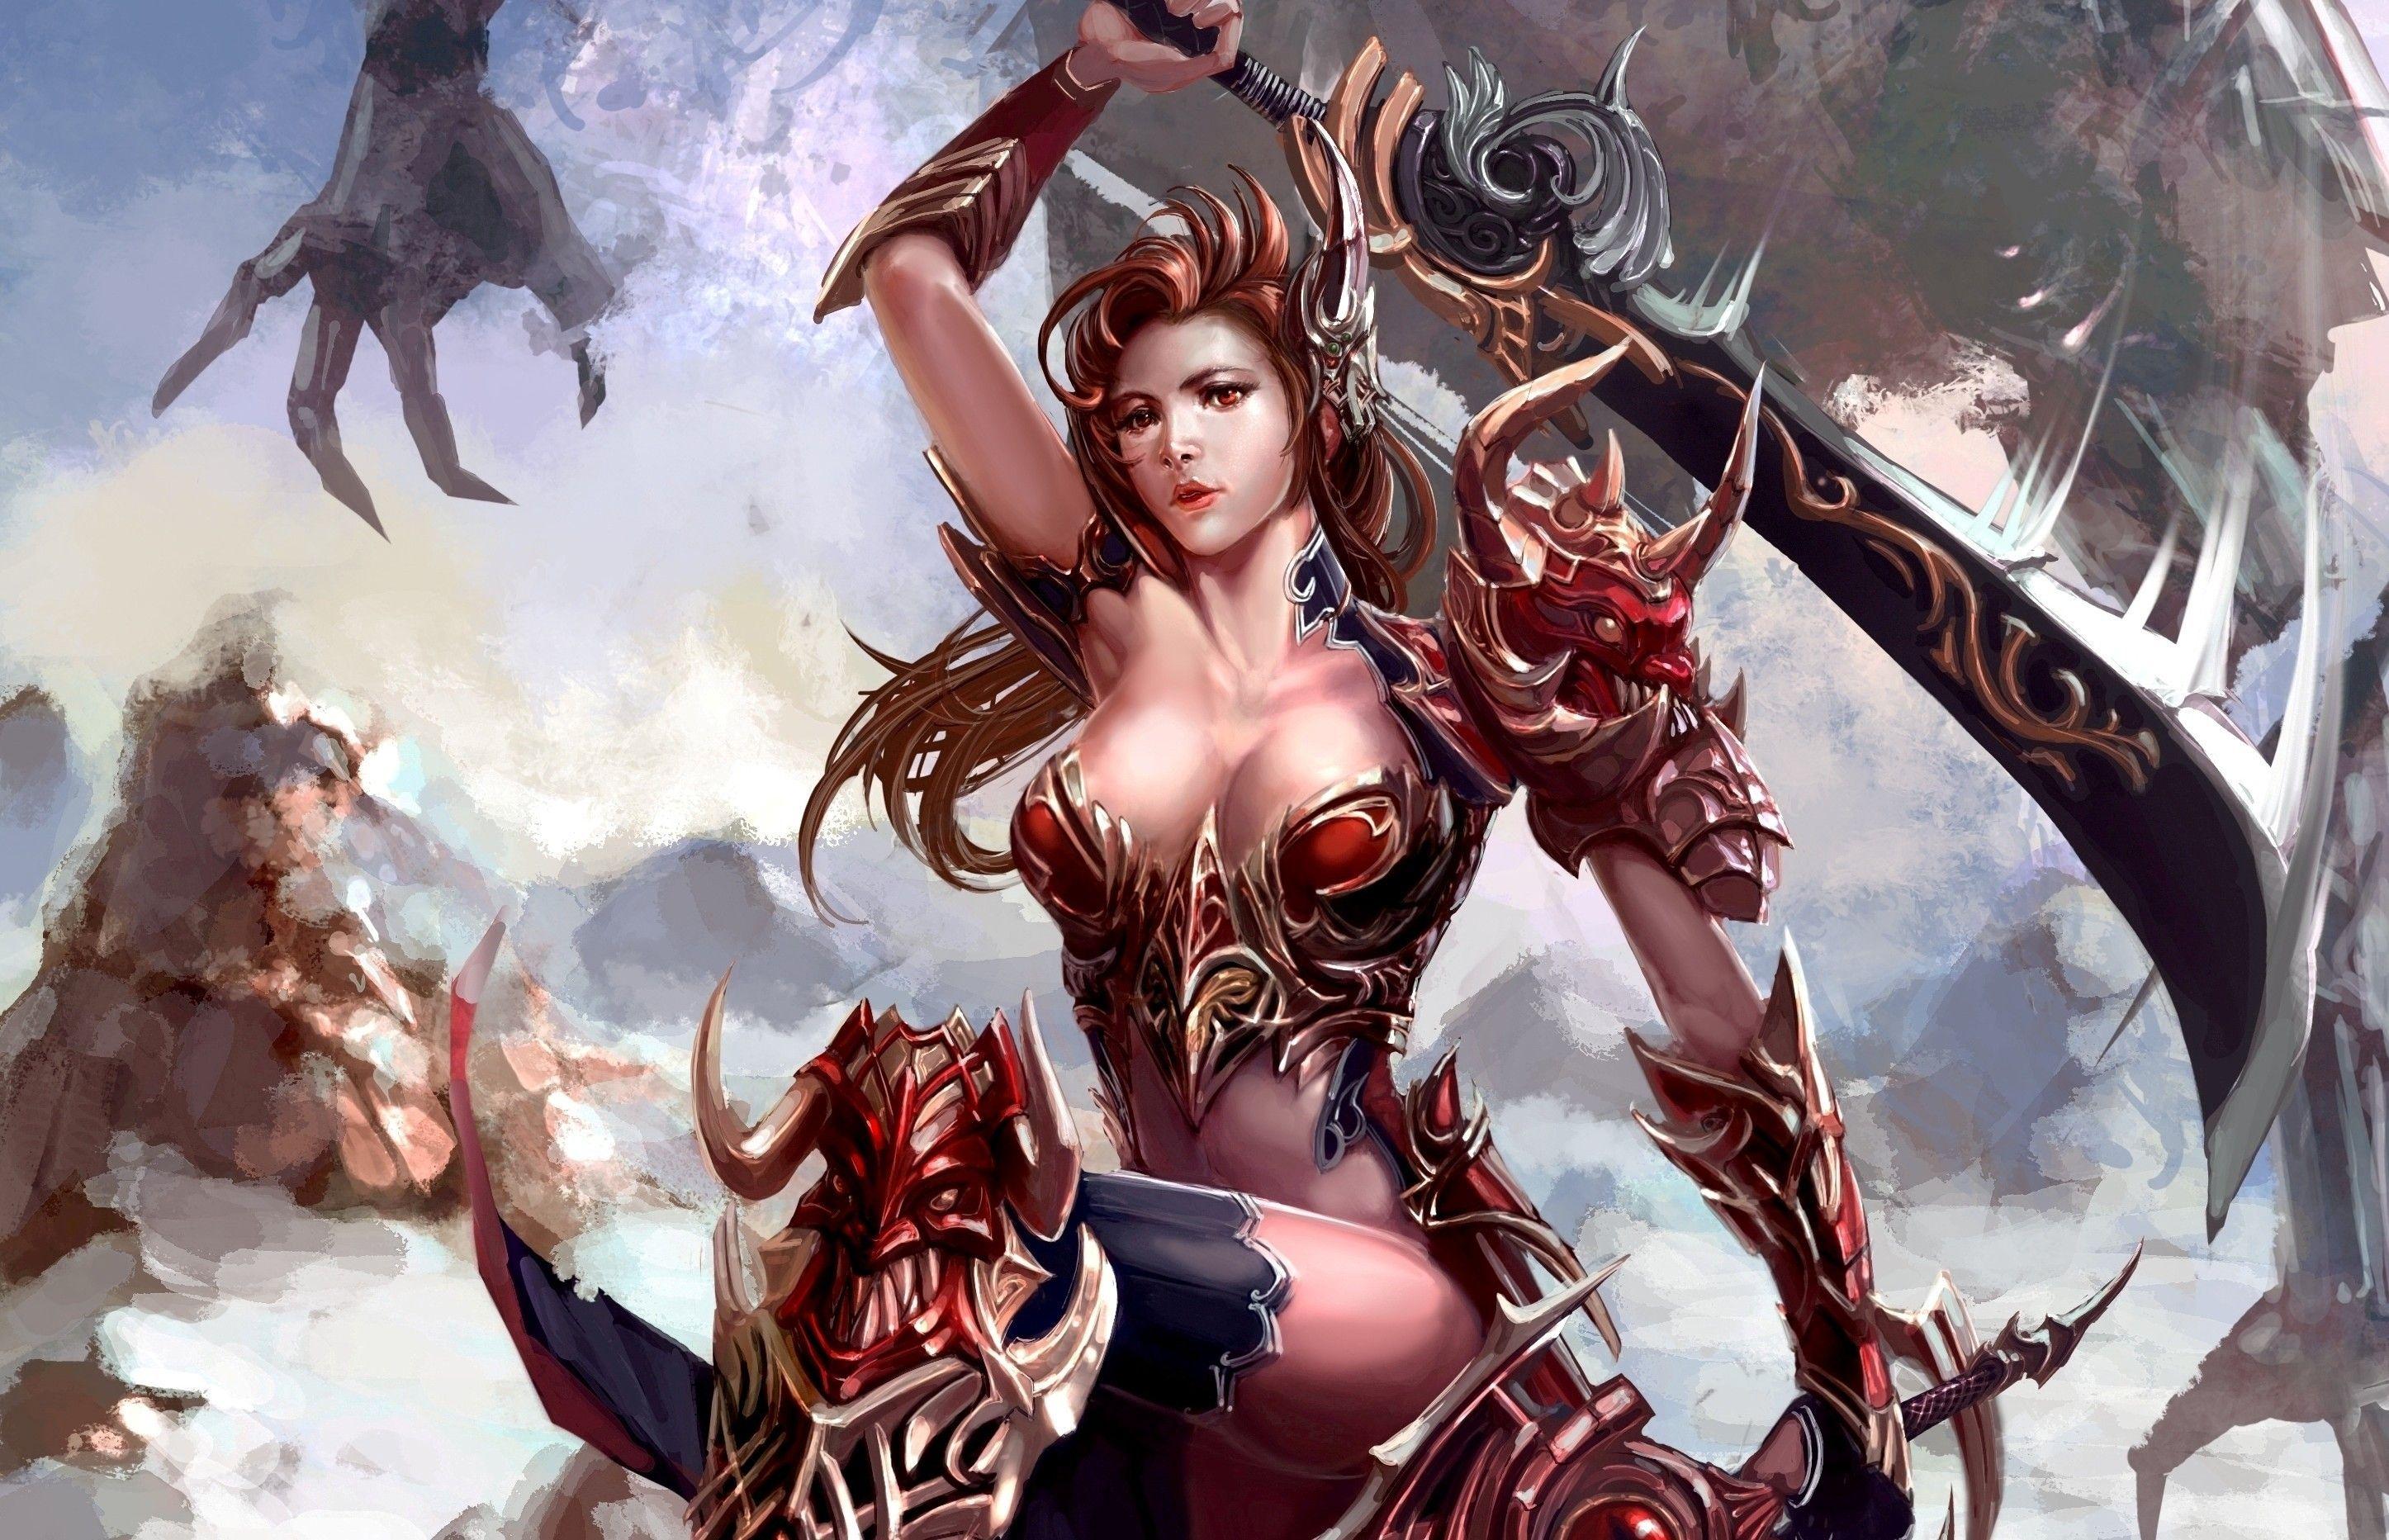 Woman warrior full book online